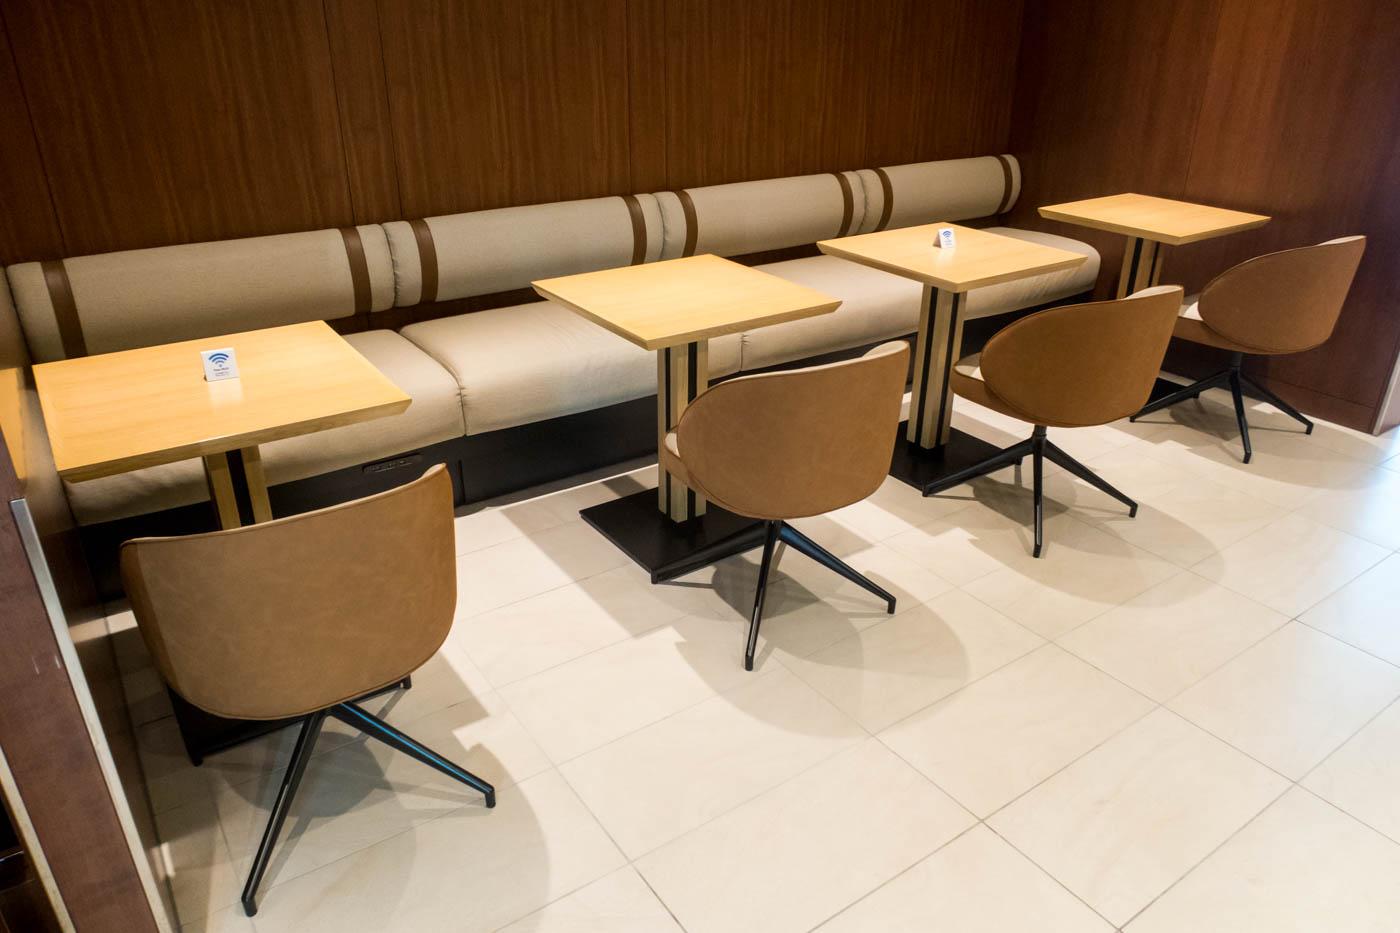 JAL Lounge Kagoshima Seating